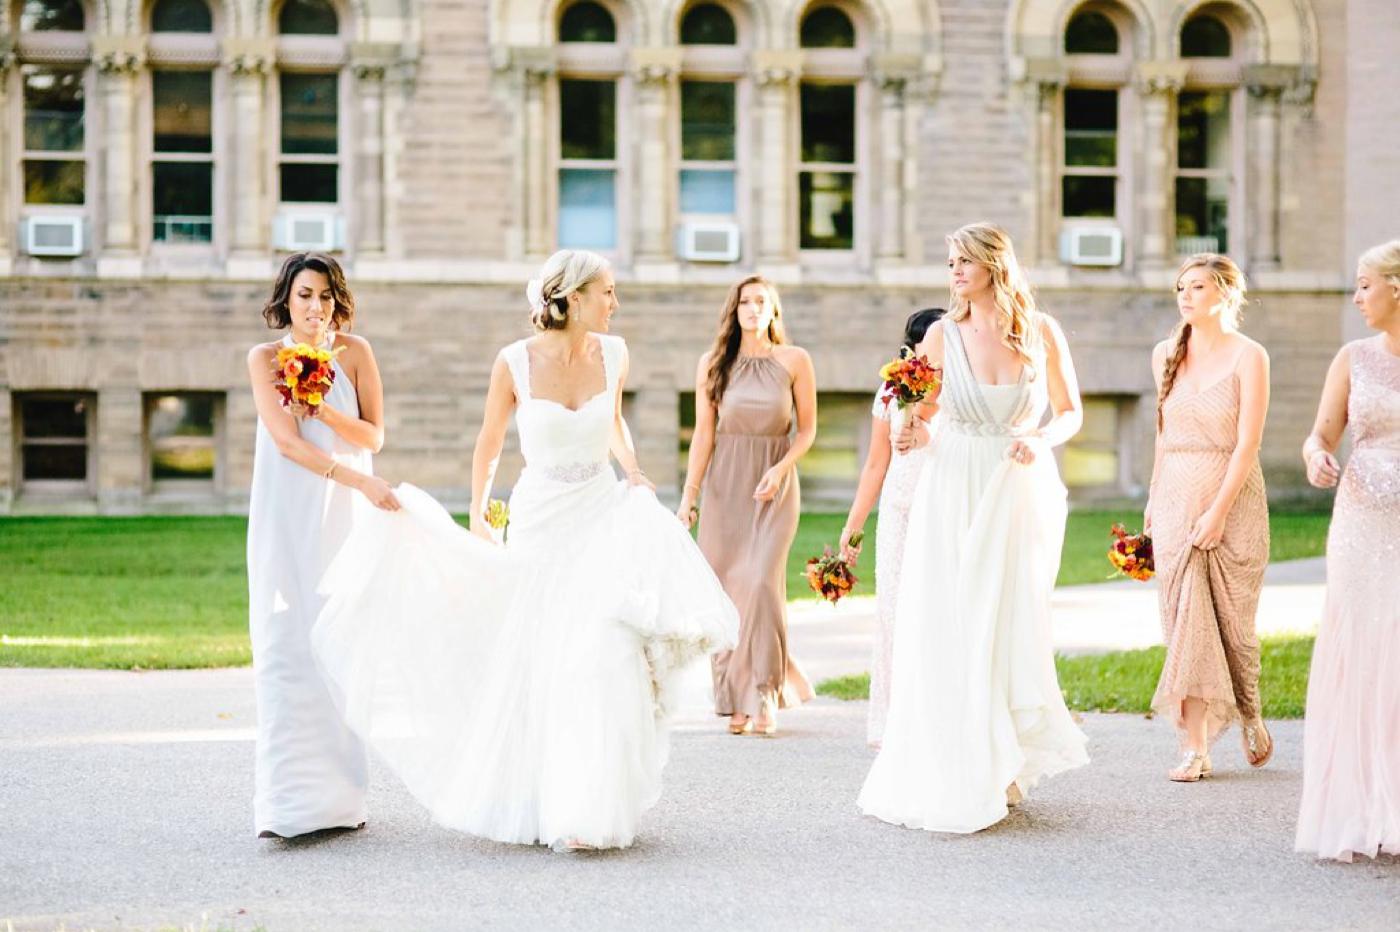 chicago-fine-art-wedding-photography-saylor30